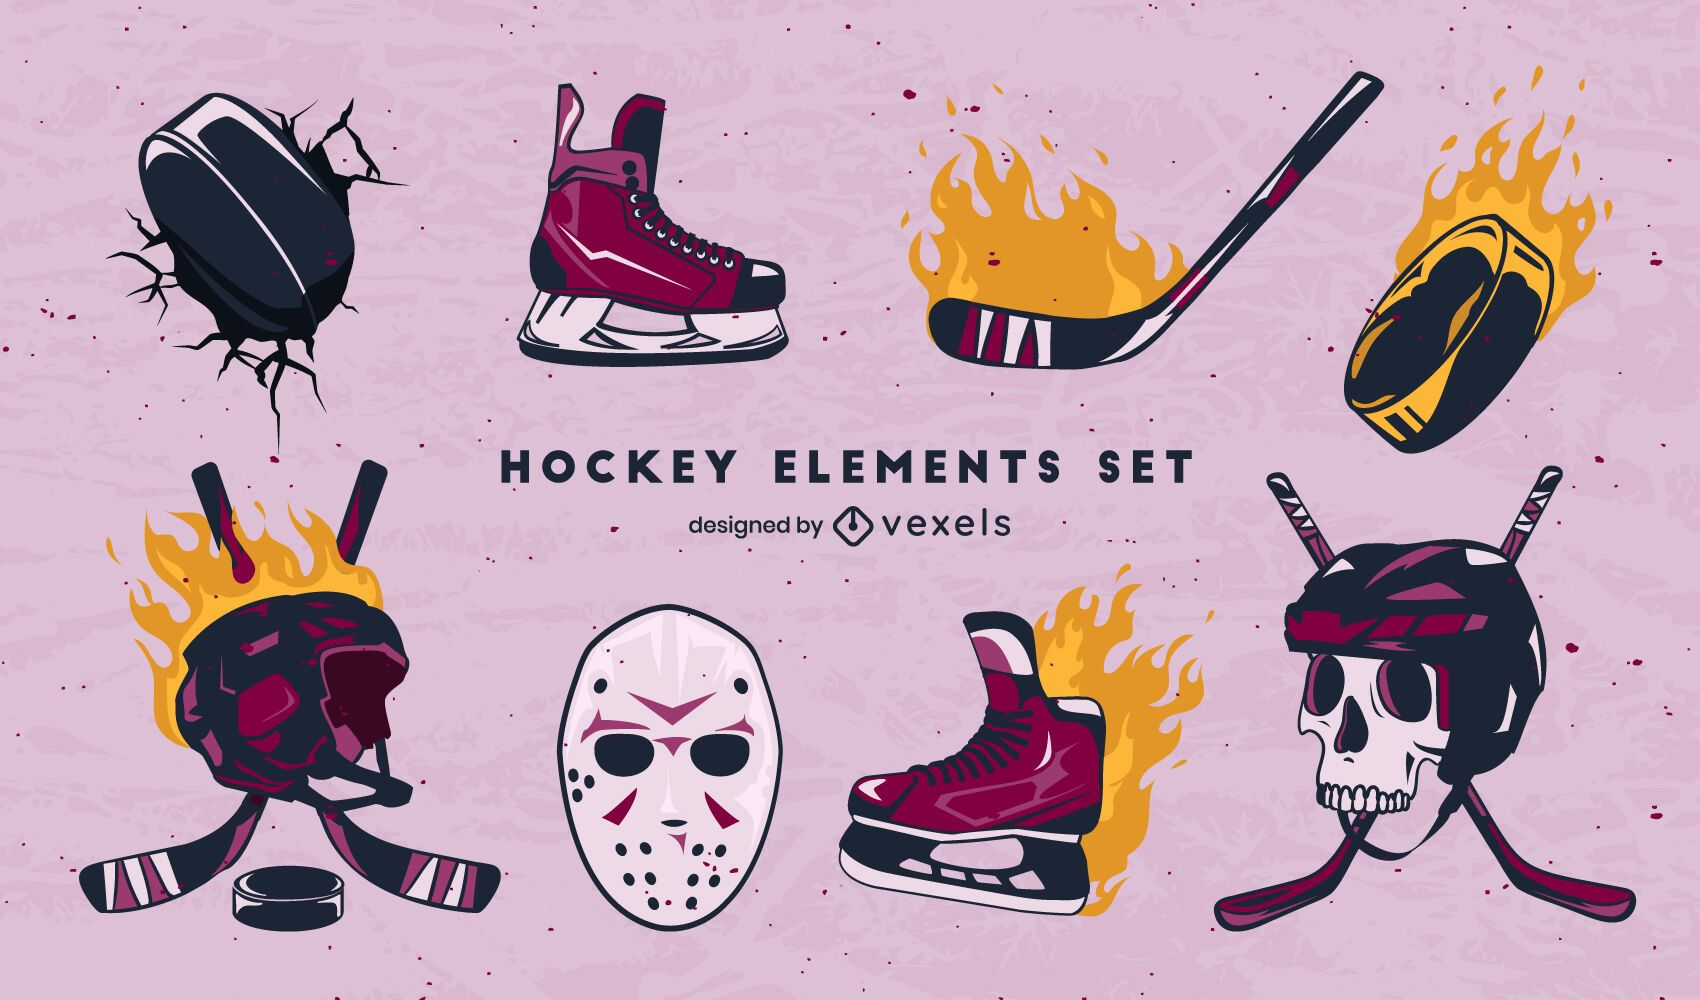 Ice hockey sport equipment on fire set